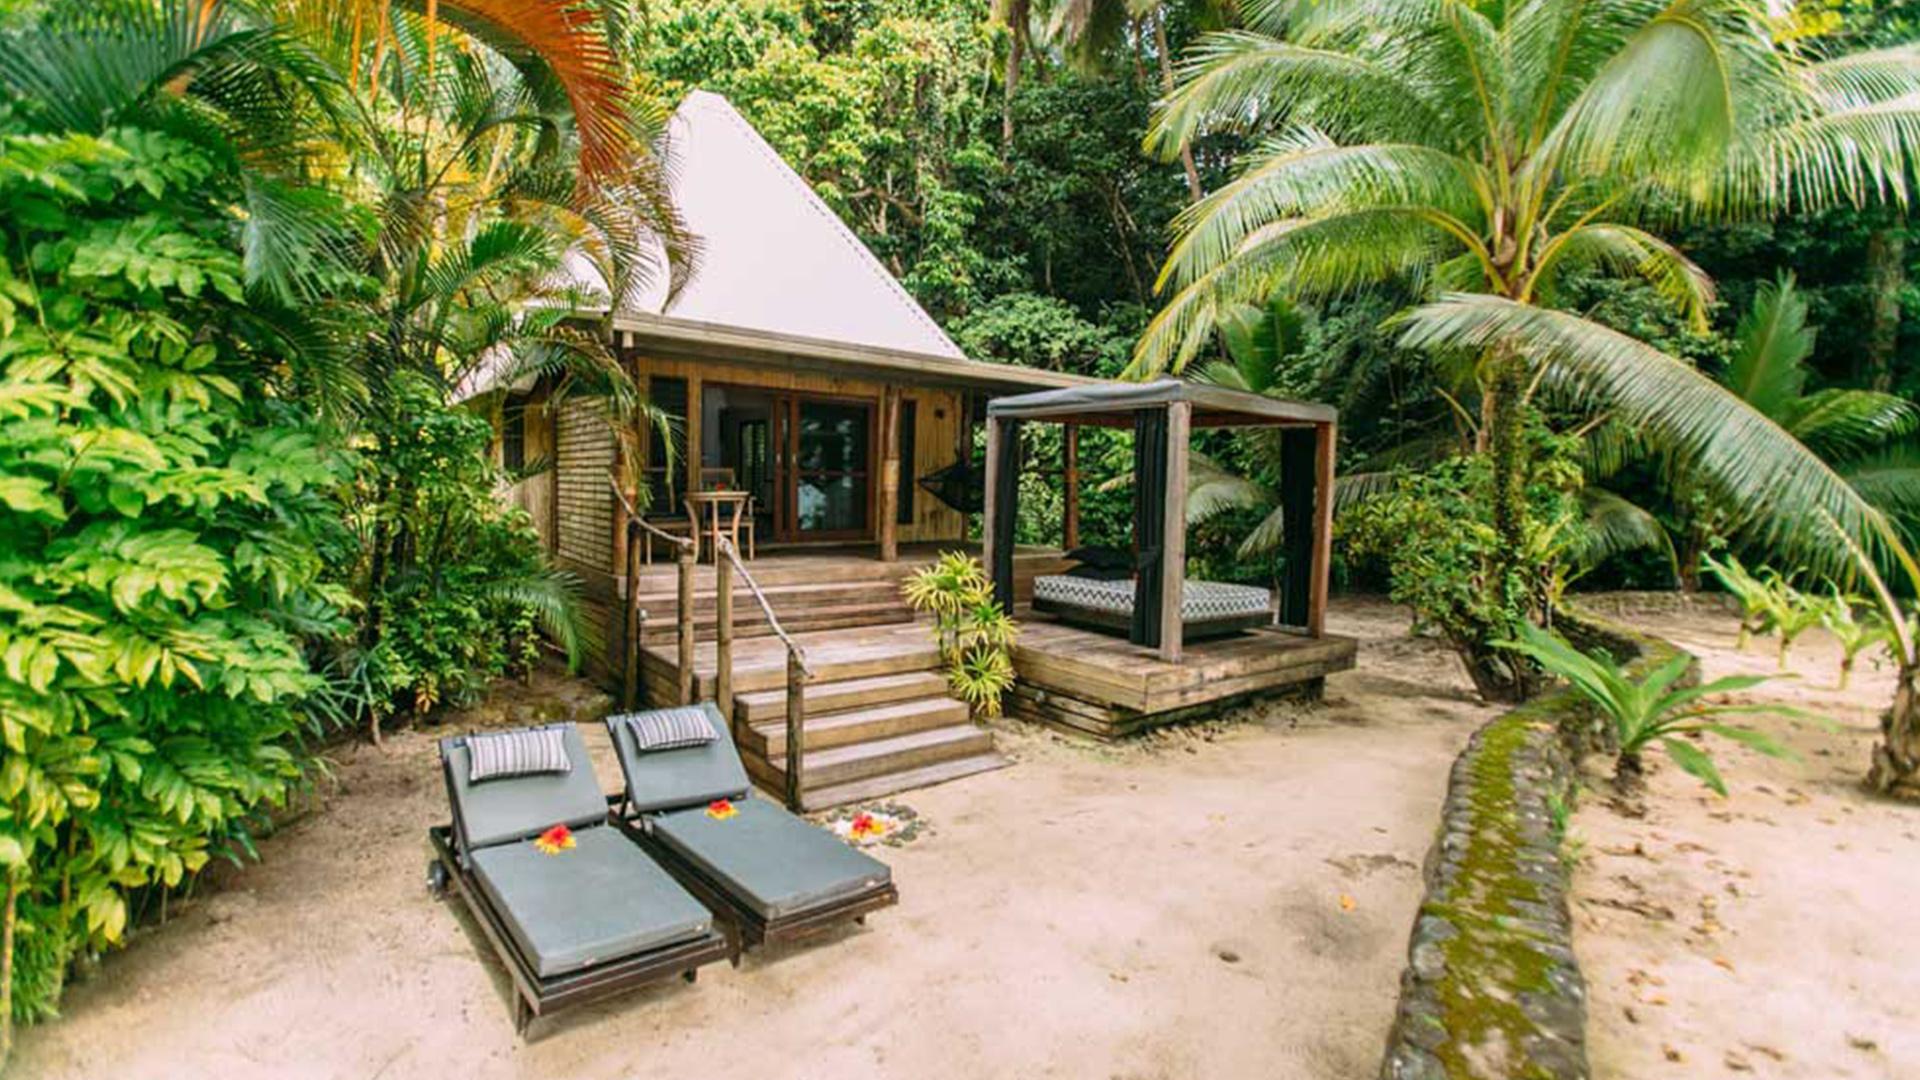 Honeymoon Bure image 1 at Qamea Resort and Spa Fiji by null, Northern Division, Fiji